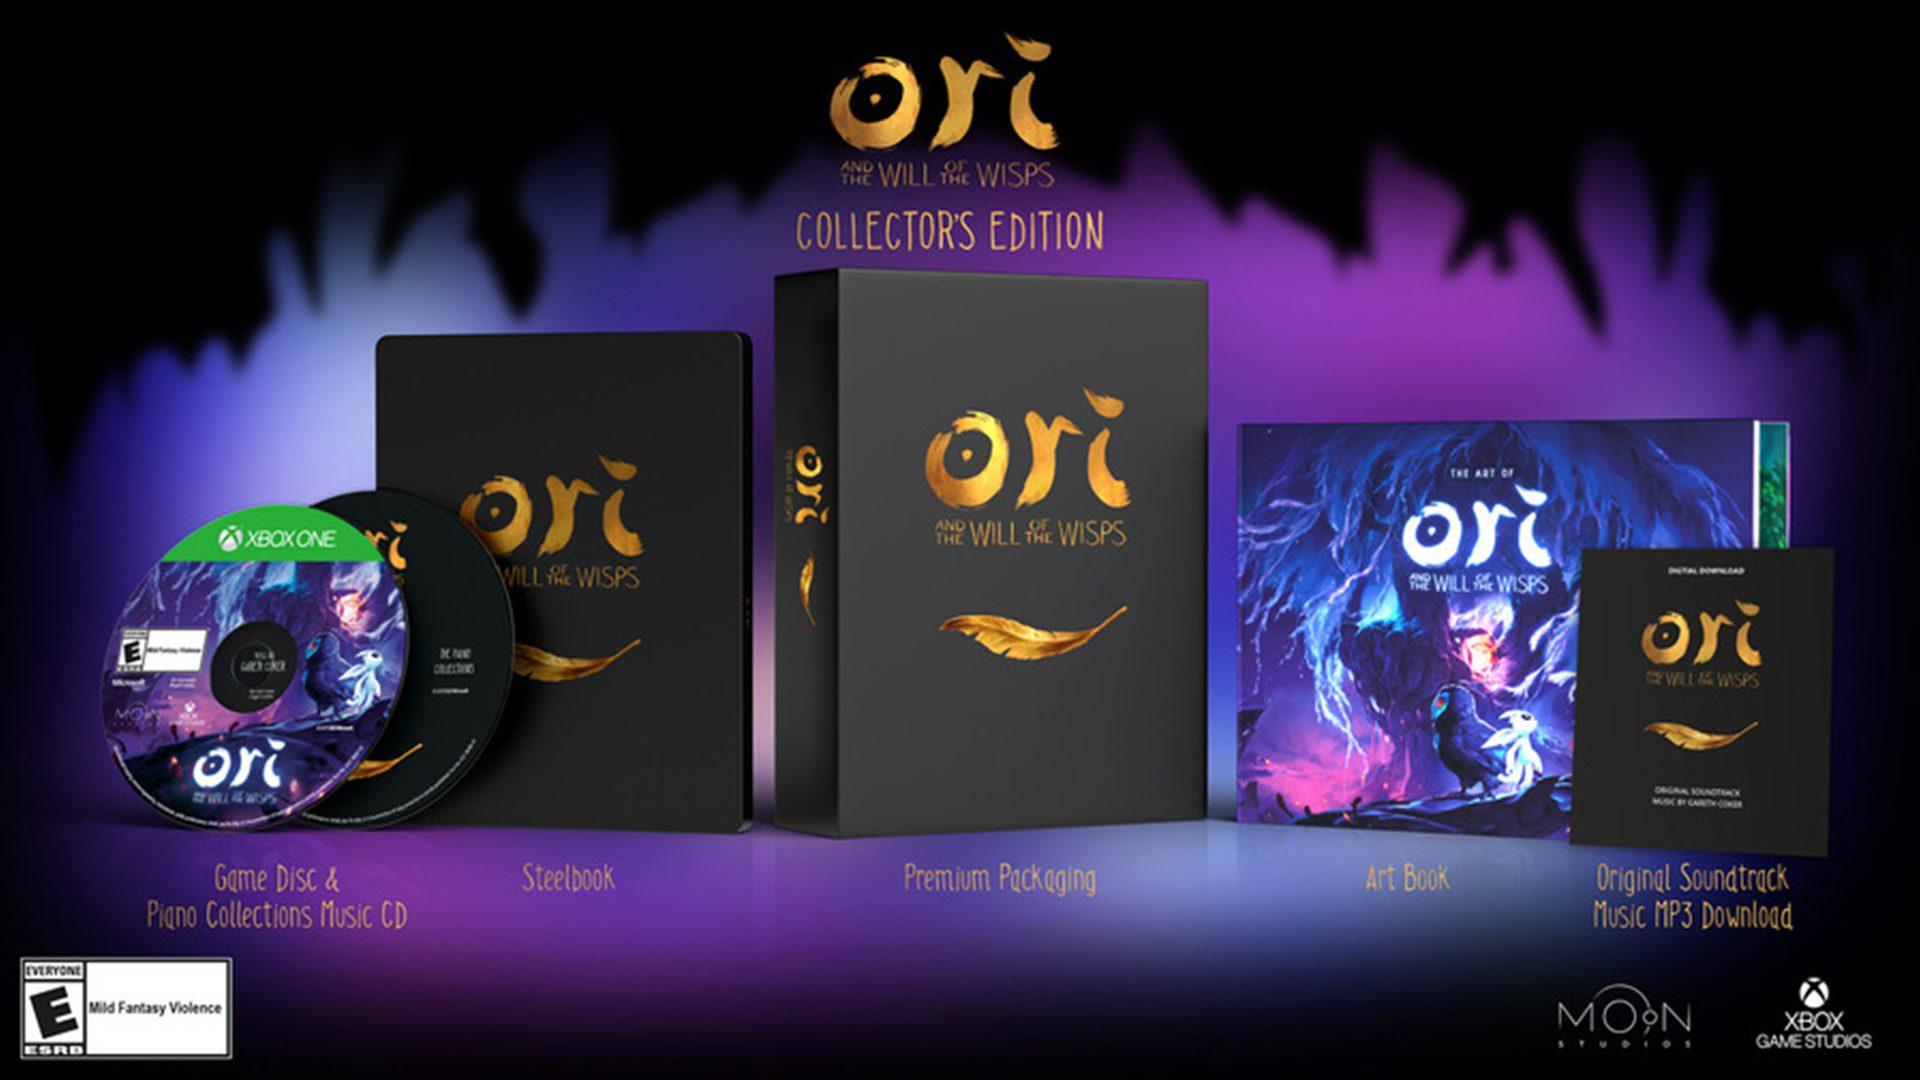 Así es la Collector's Edition de Ori and the Will of the Wisps